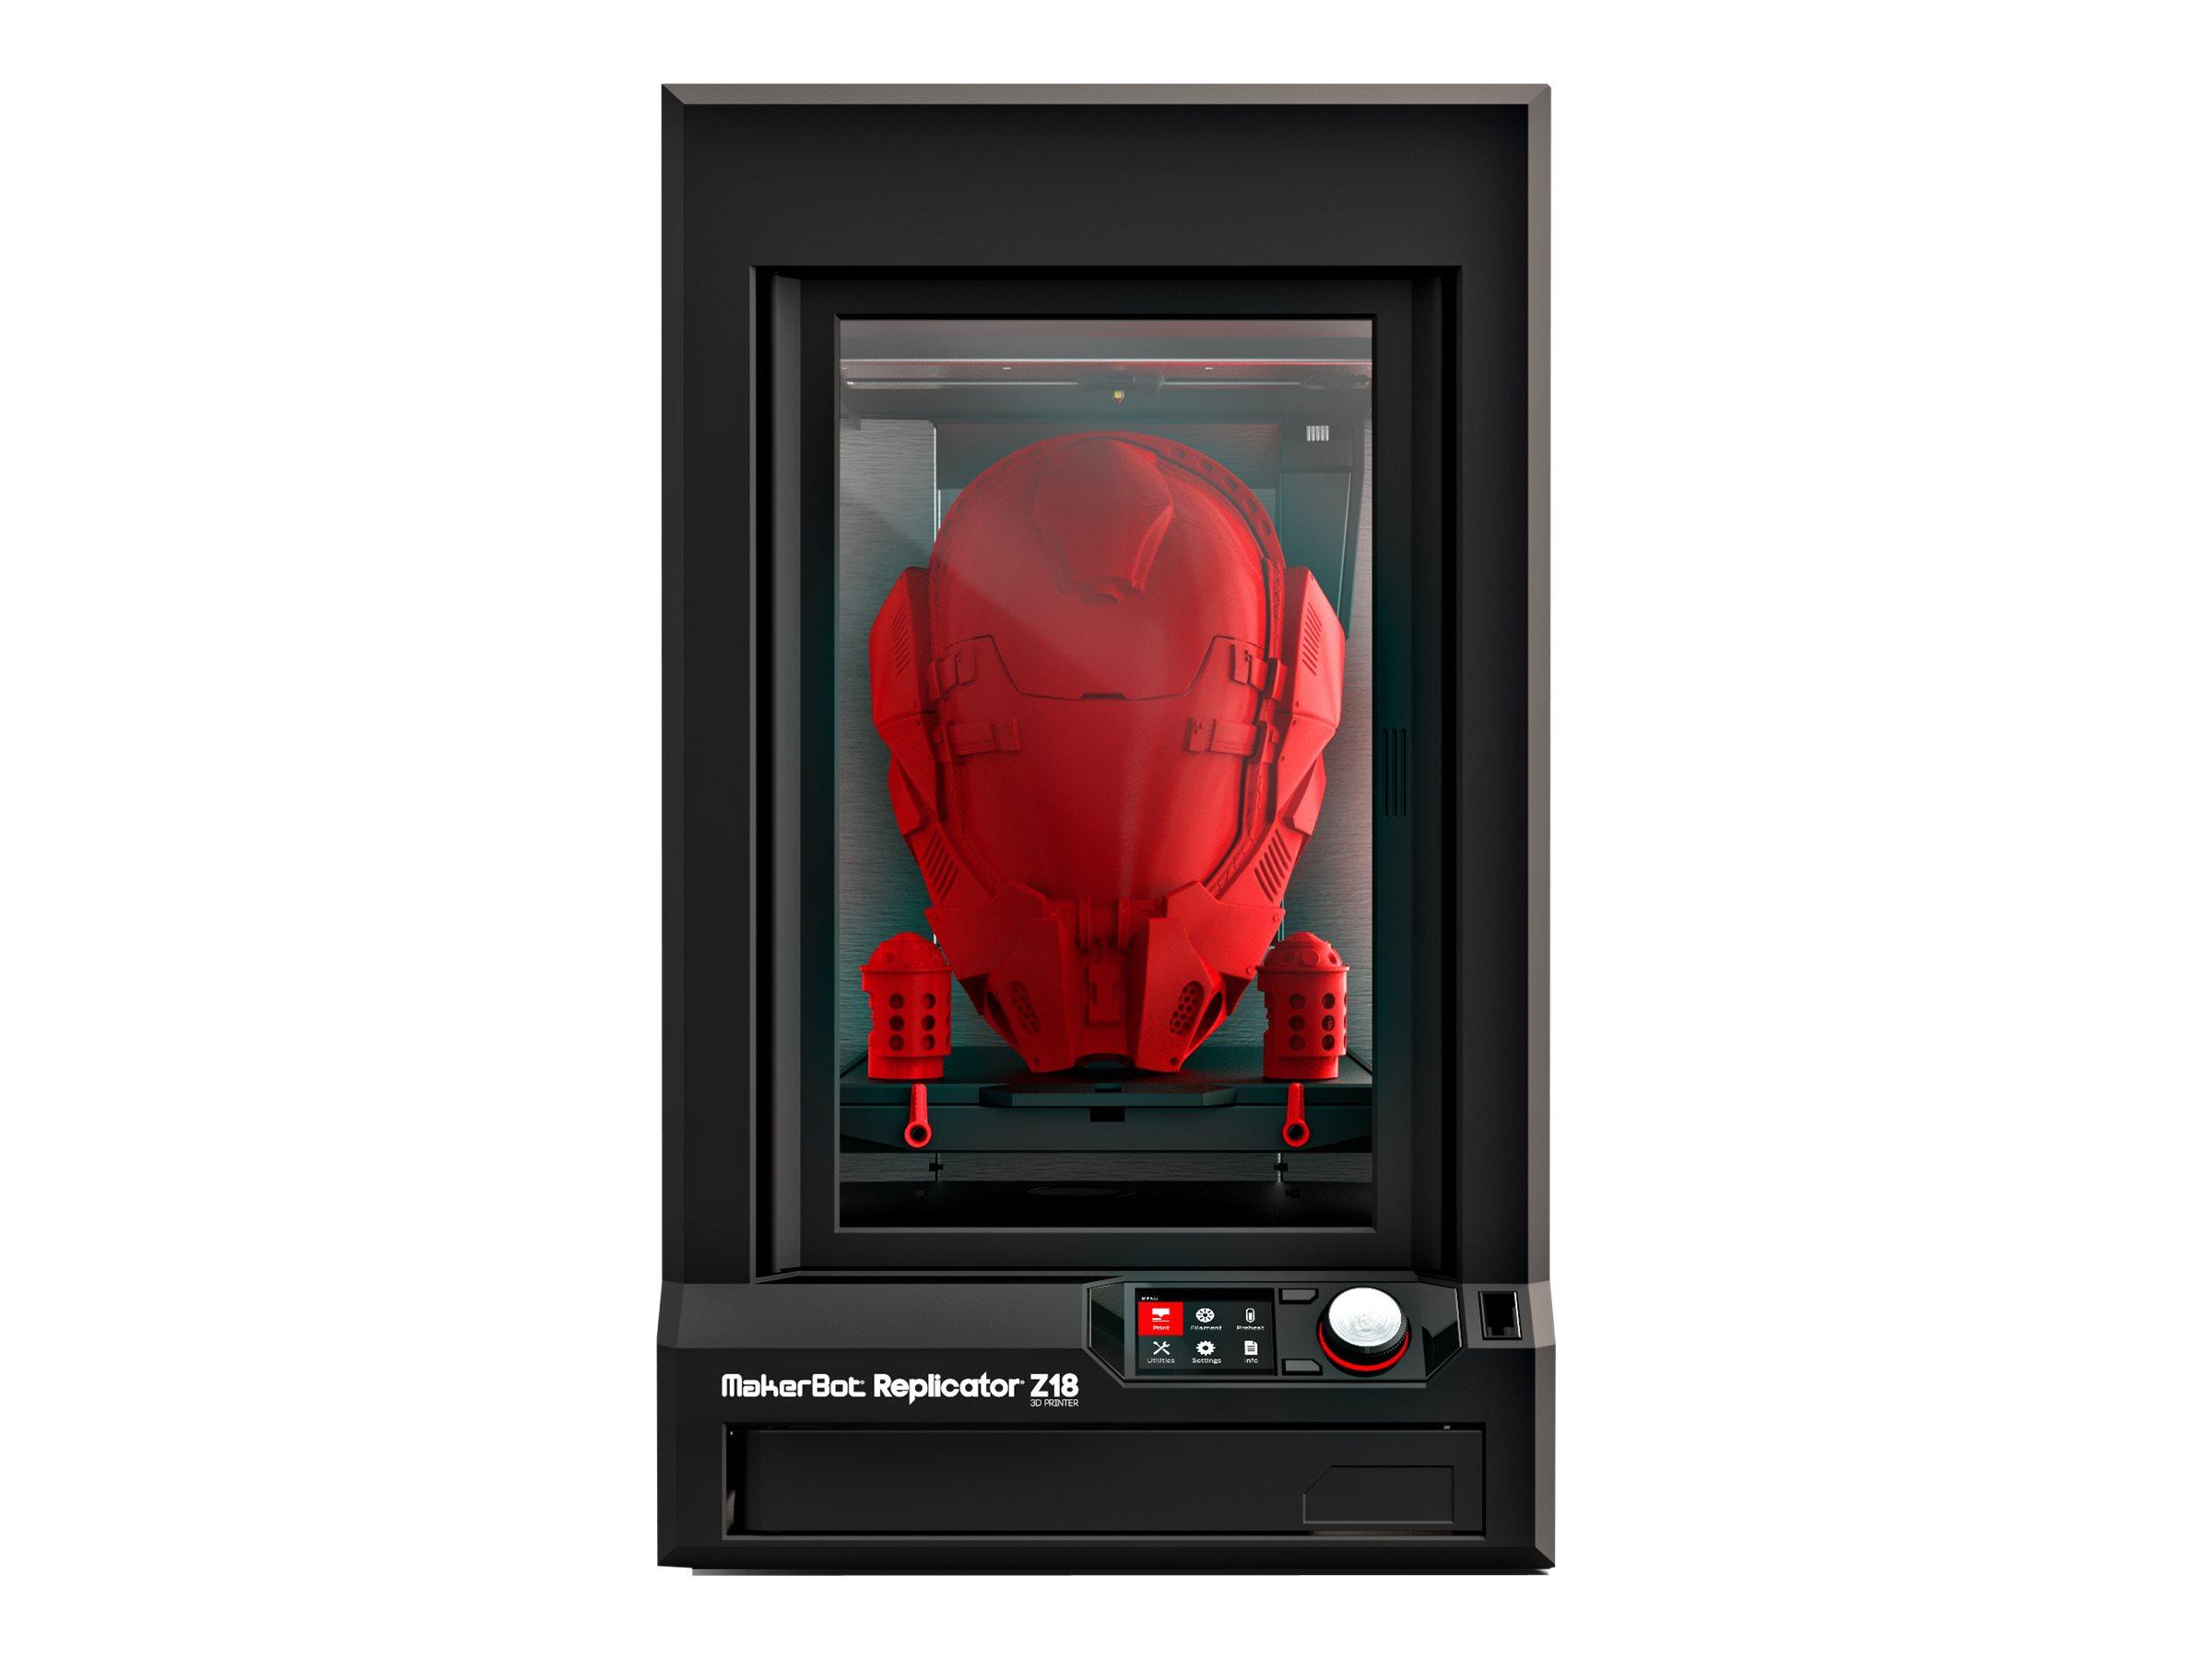 MakerBot Replicator Z18 - 3D-Drucker - FDM - max. Baugrösse 457 x 305 x 305 mm - Schicht: 100 µm - USB, LAN, USB-Host, Wi-Fi